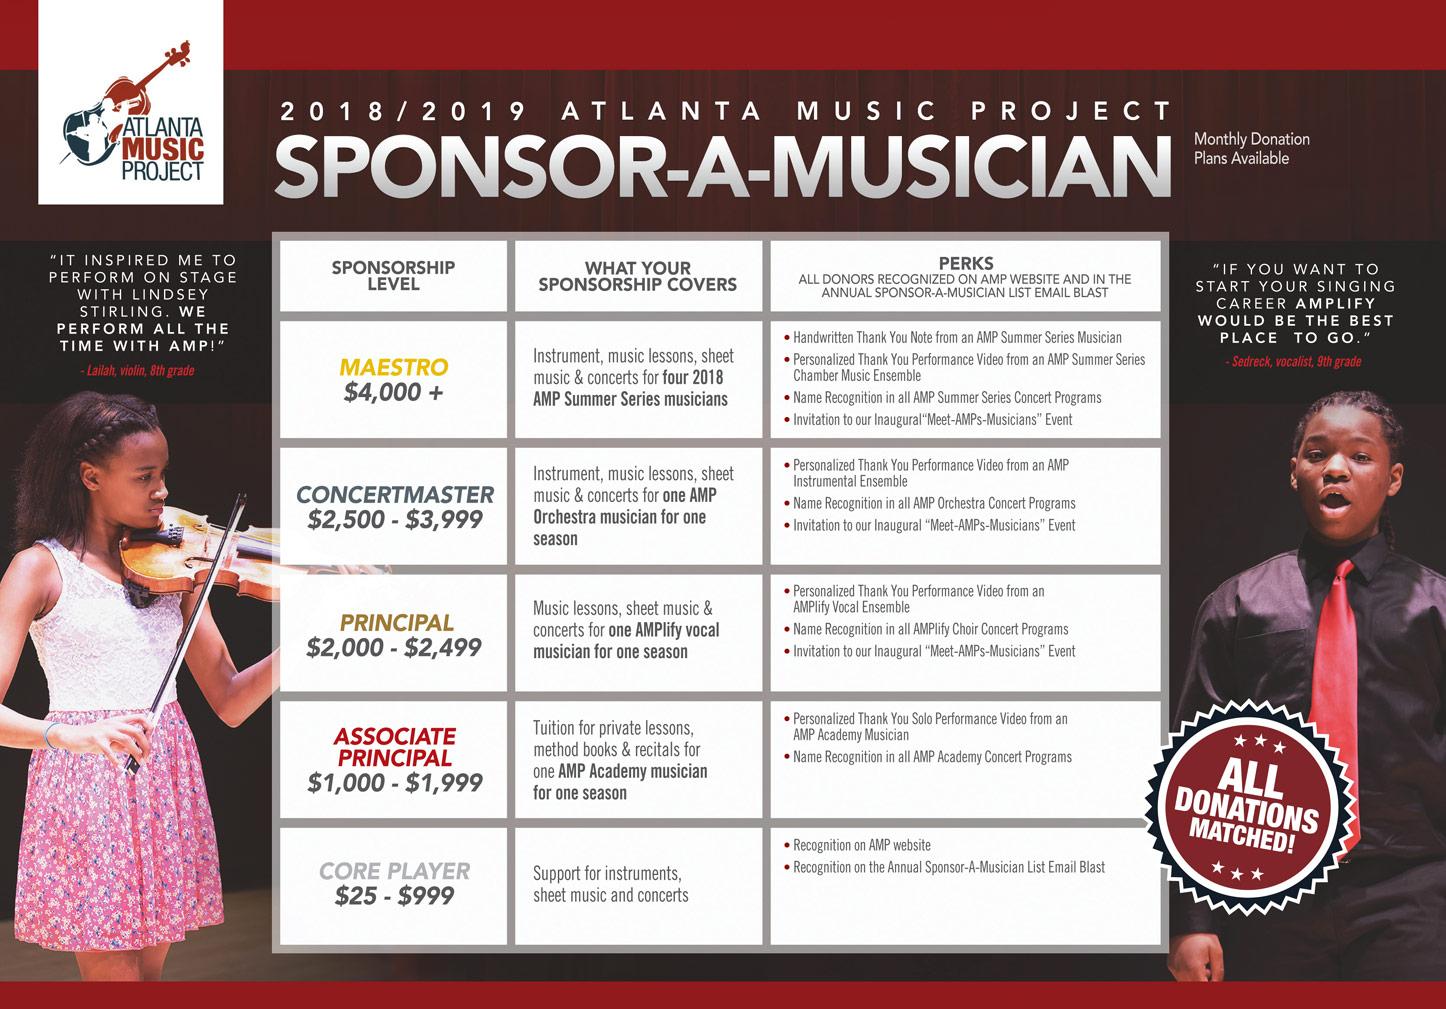 sponsor-a-musician 2018